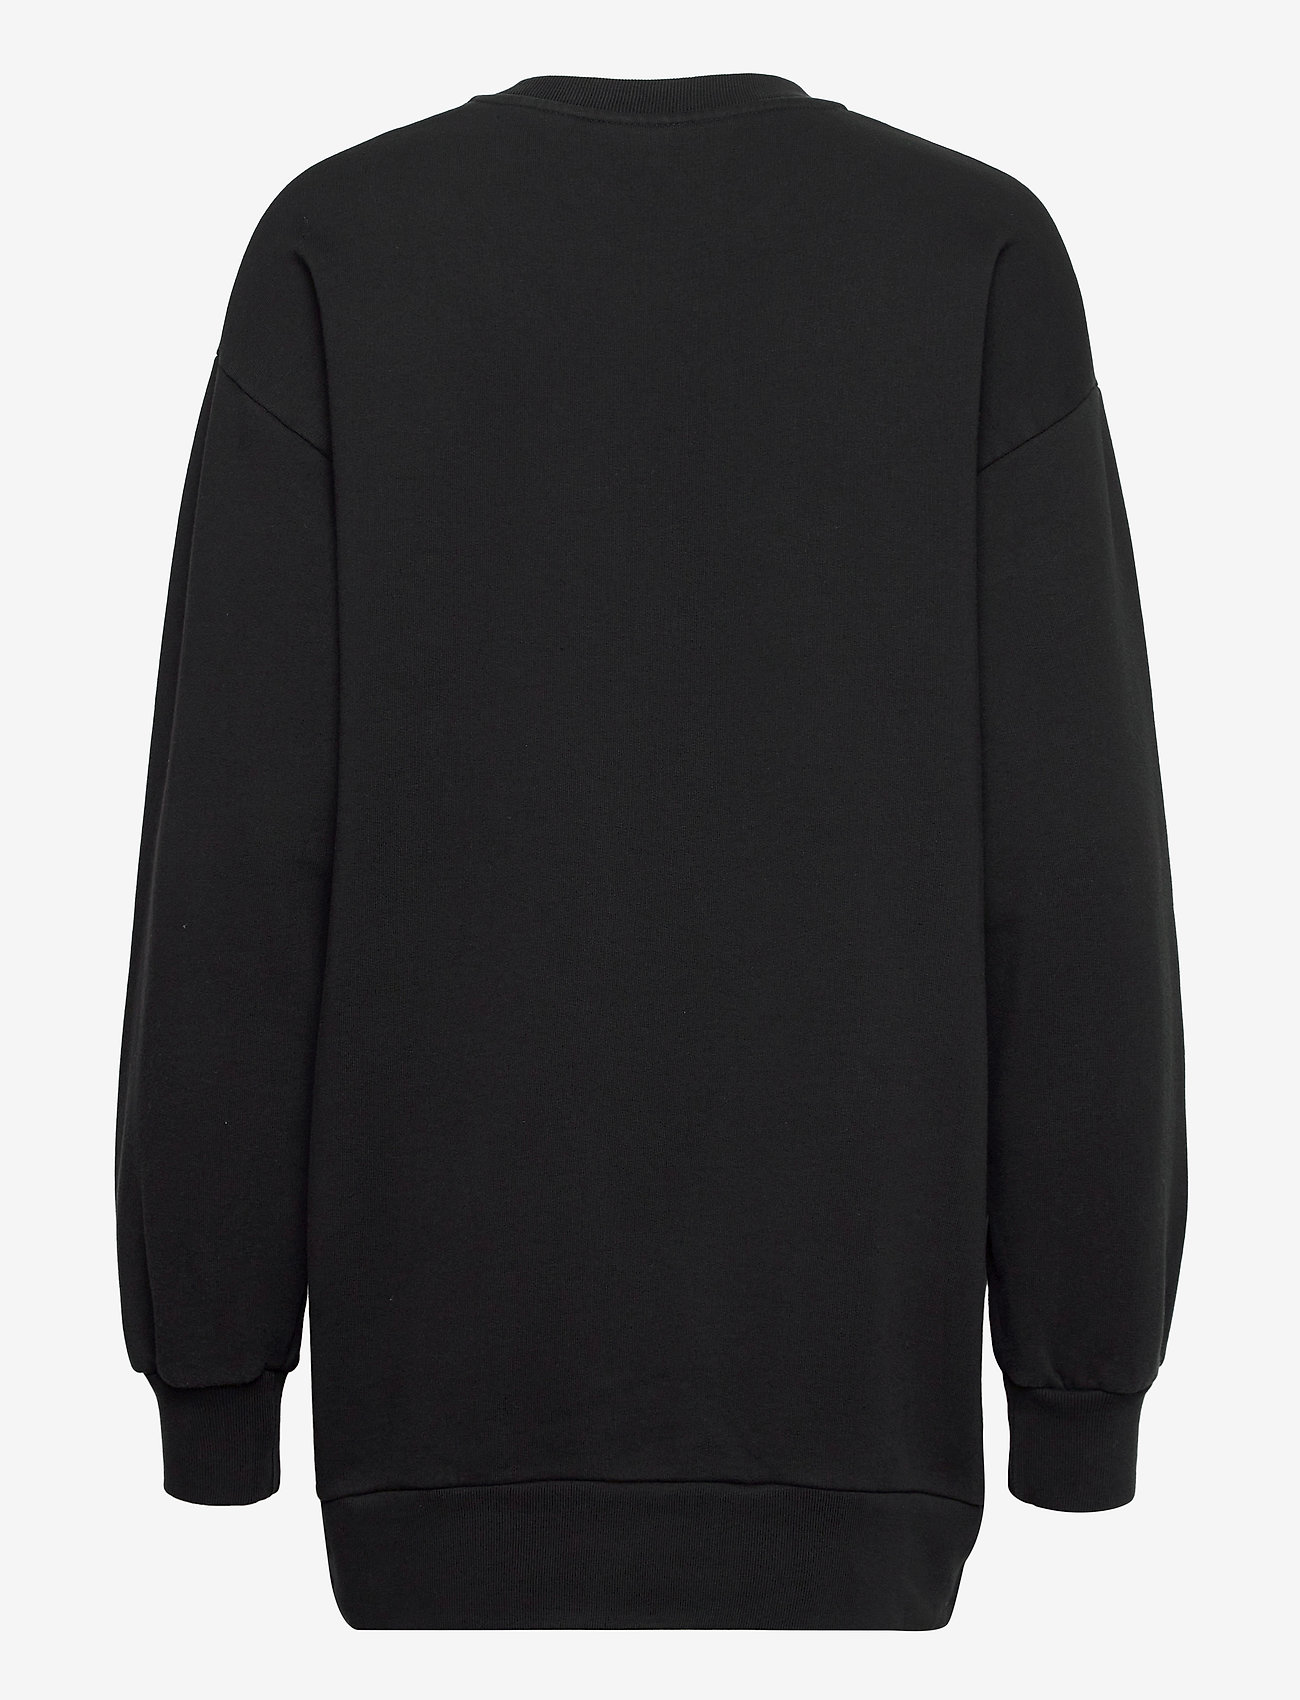 HAN Kjøbenhavn - Relaxed Crew - sweatshirts - faded black - 1